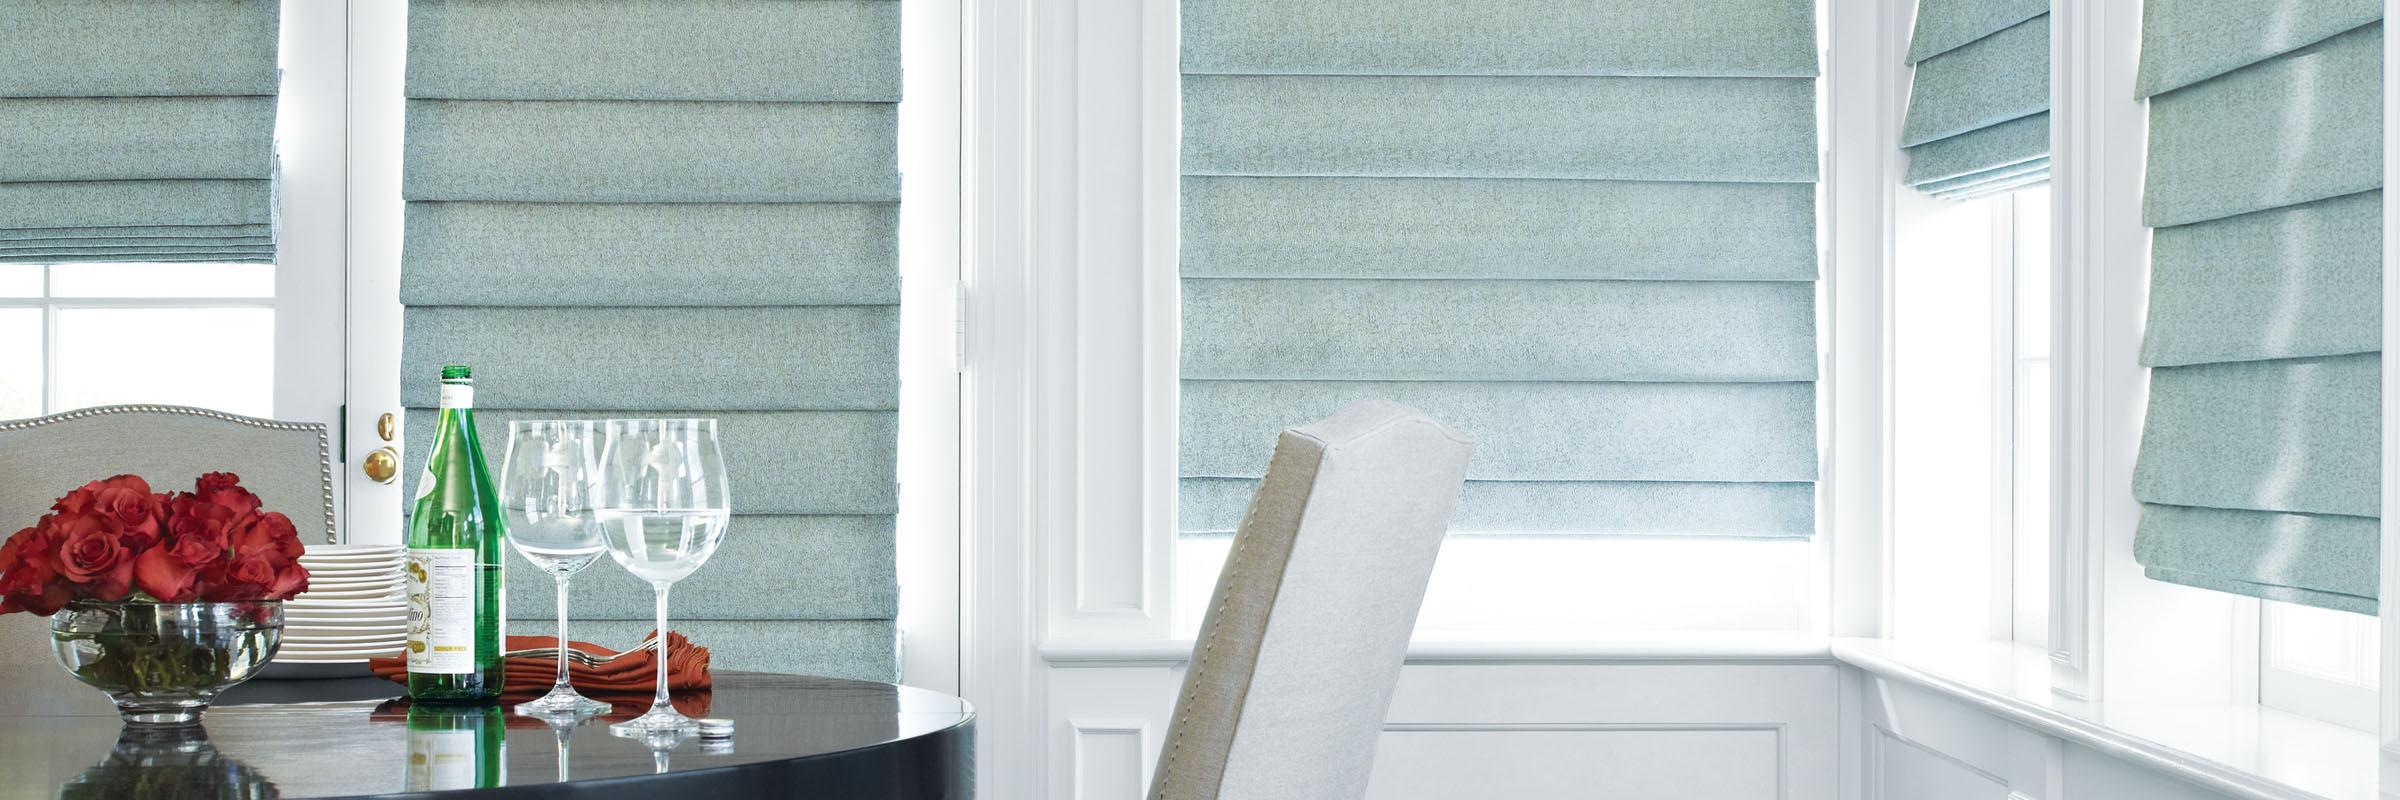 fabric-roman-shades-design-studio-carousel-05.jpg